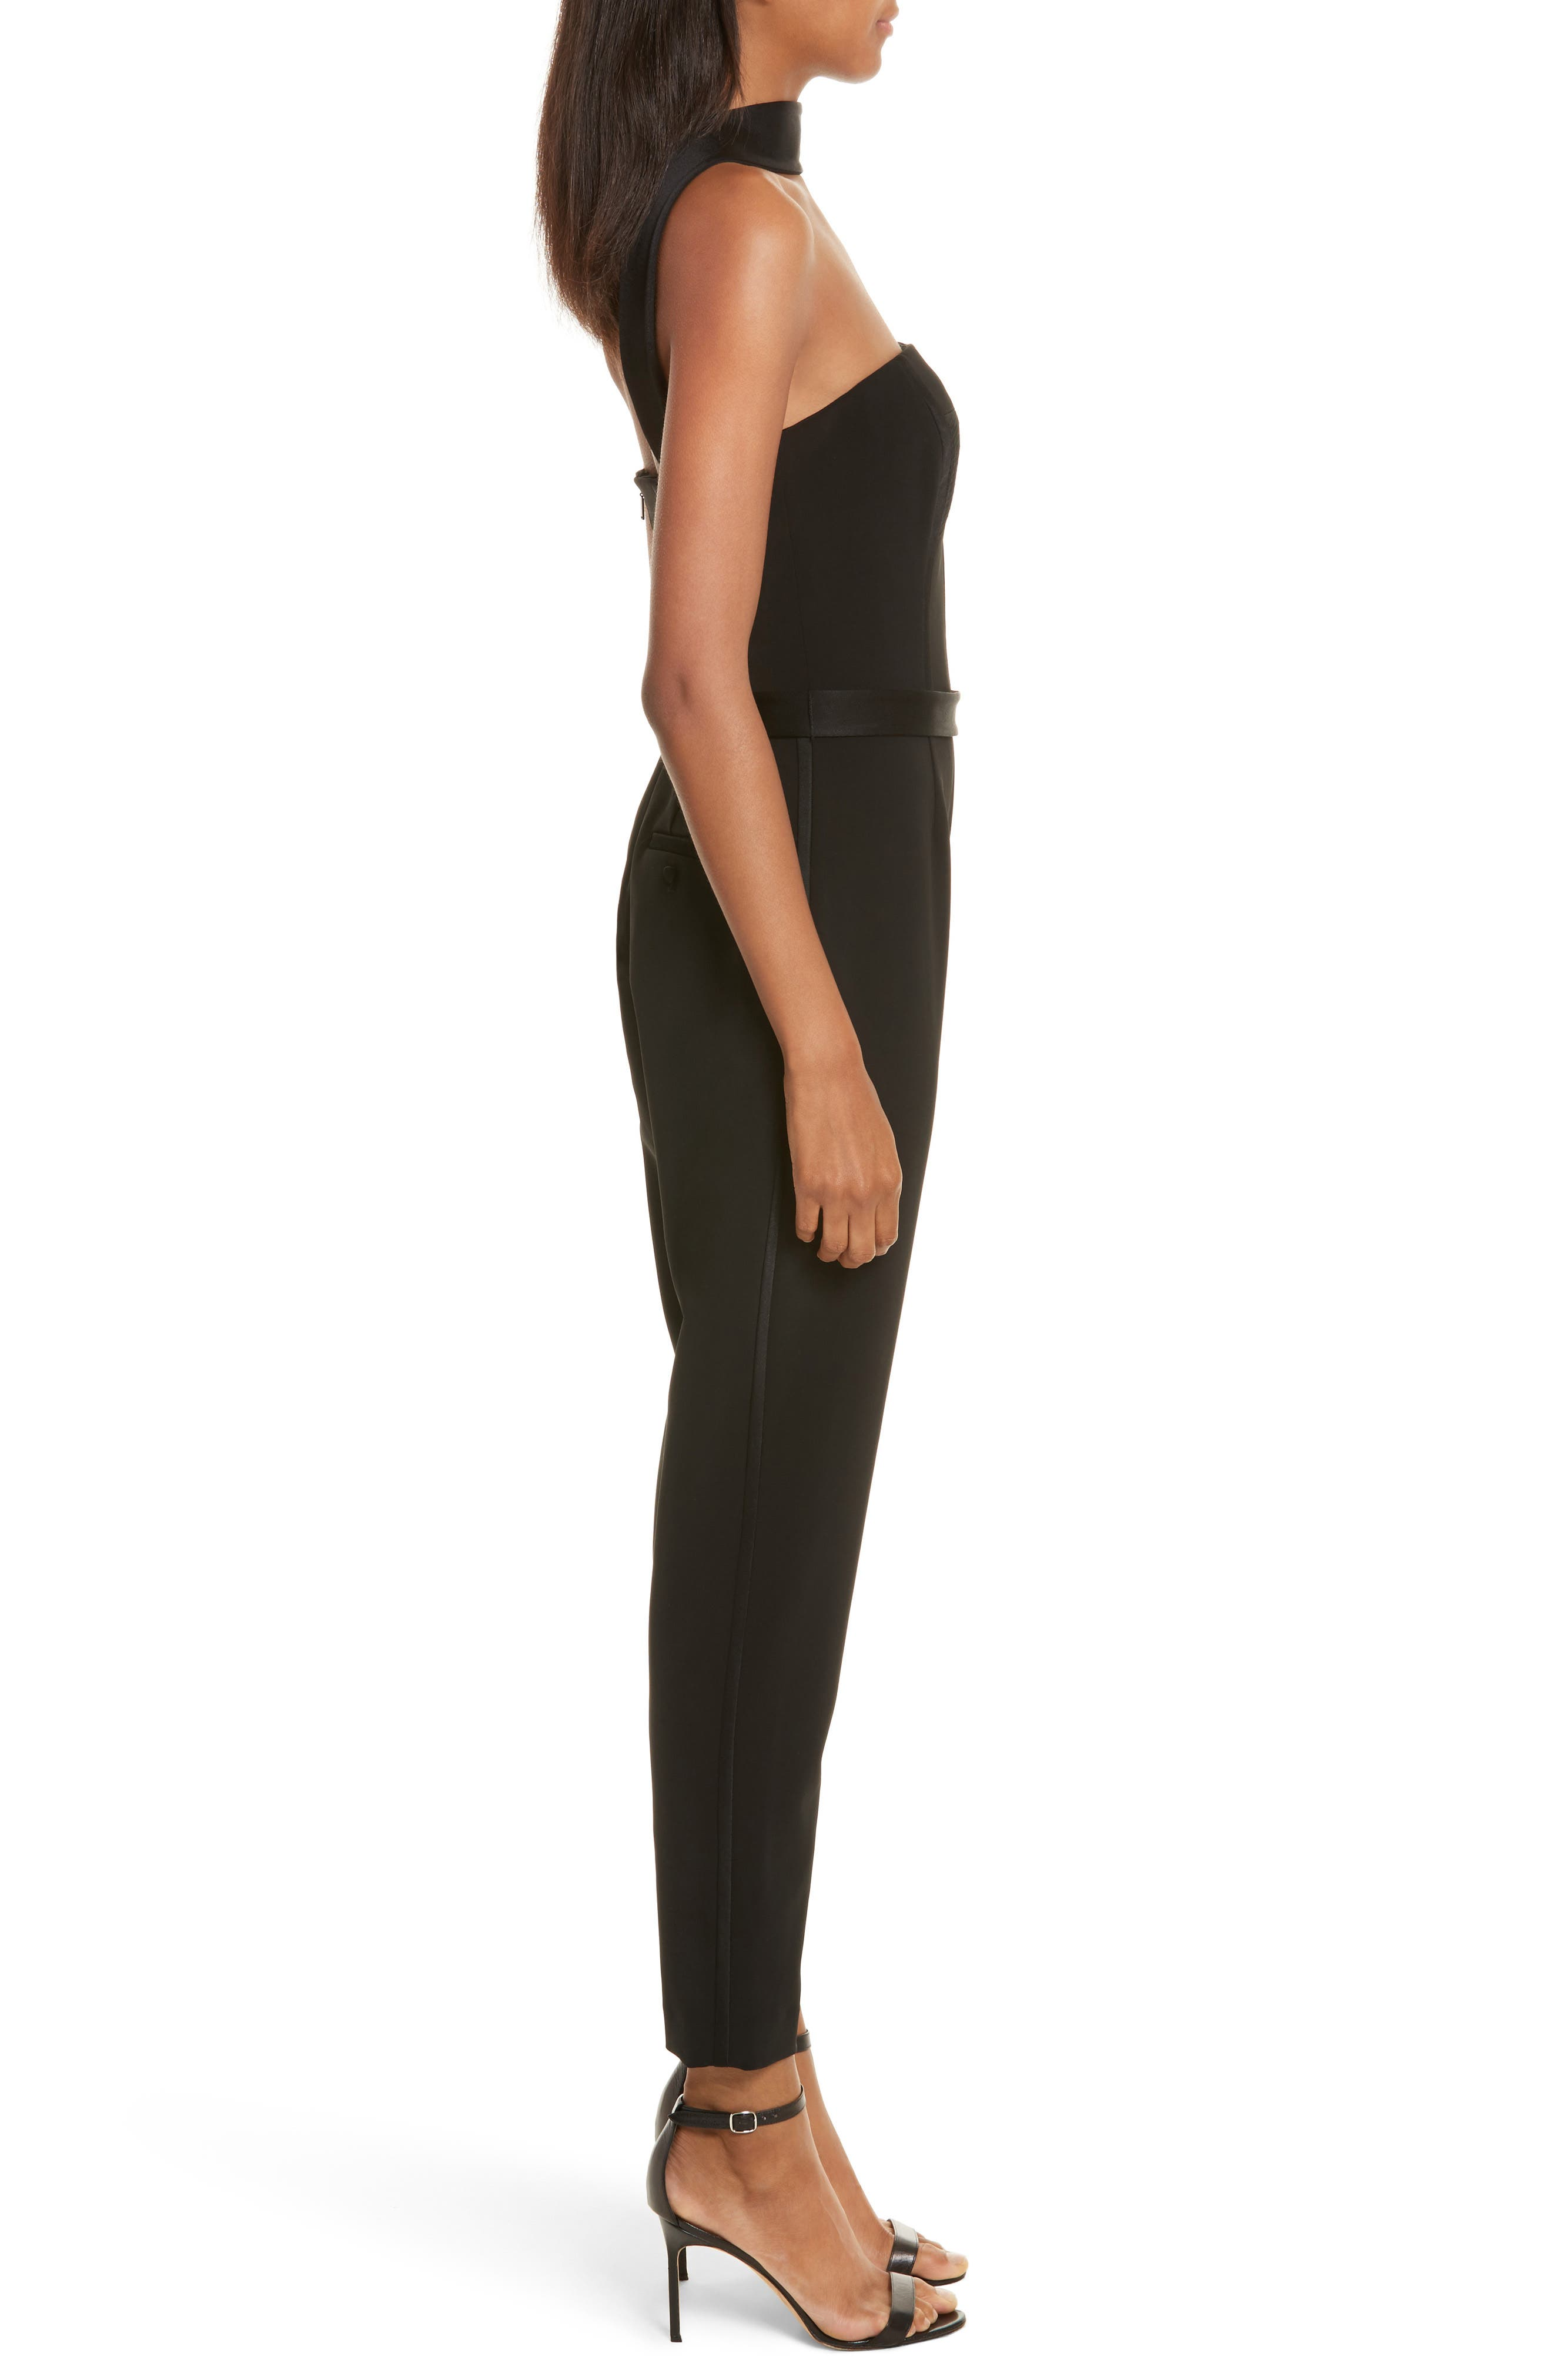 Diane Kruger x GREY Jason Wu Crepe Straight Leg Jumpsuit,                             Alternate thumbnail 3, color,                             001